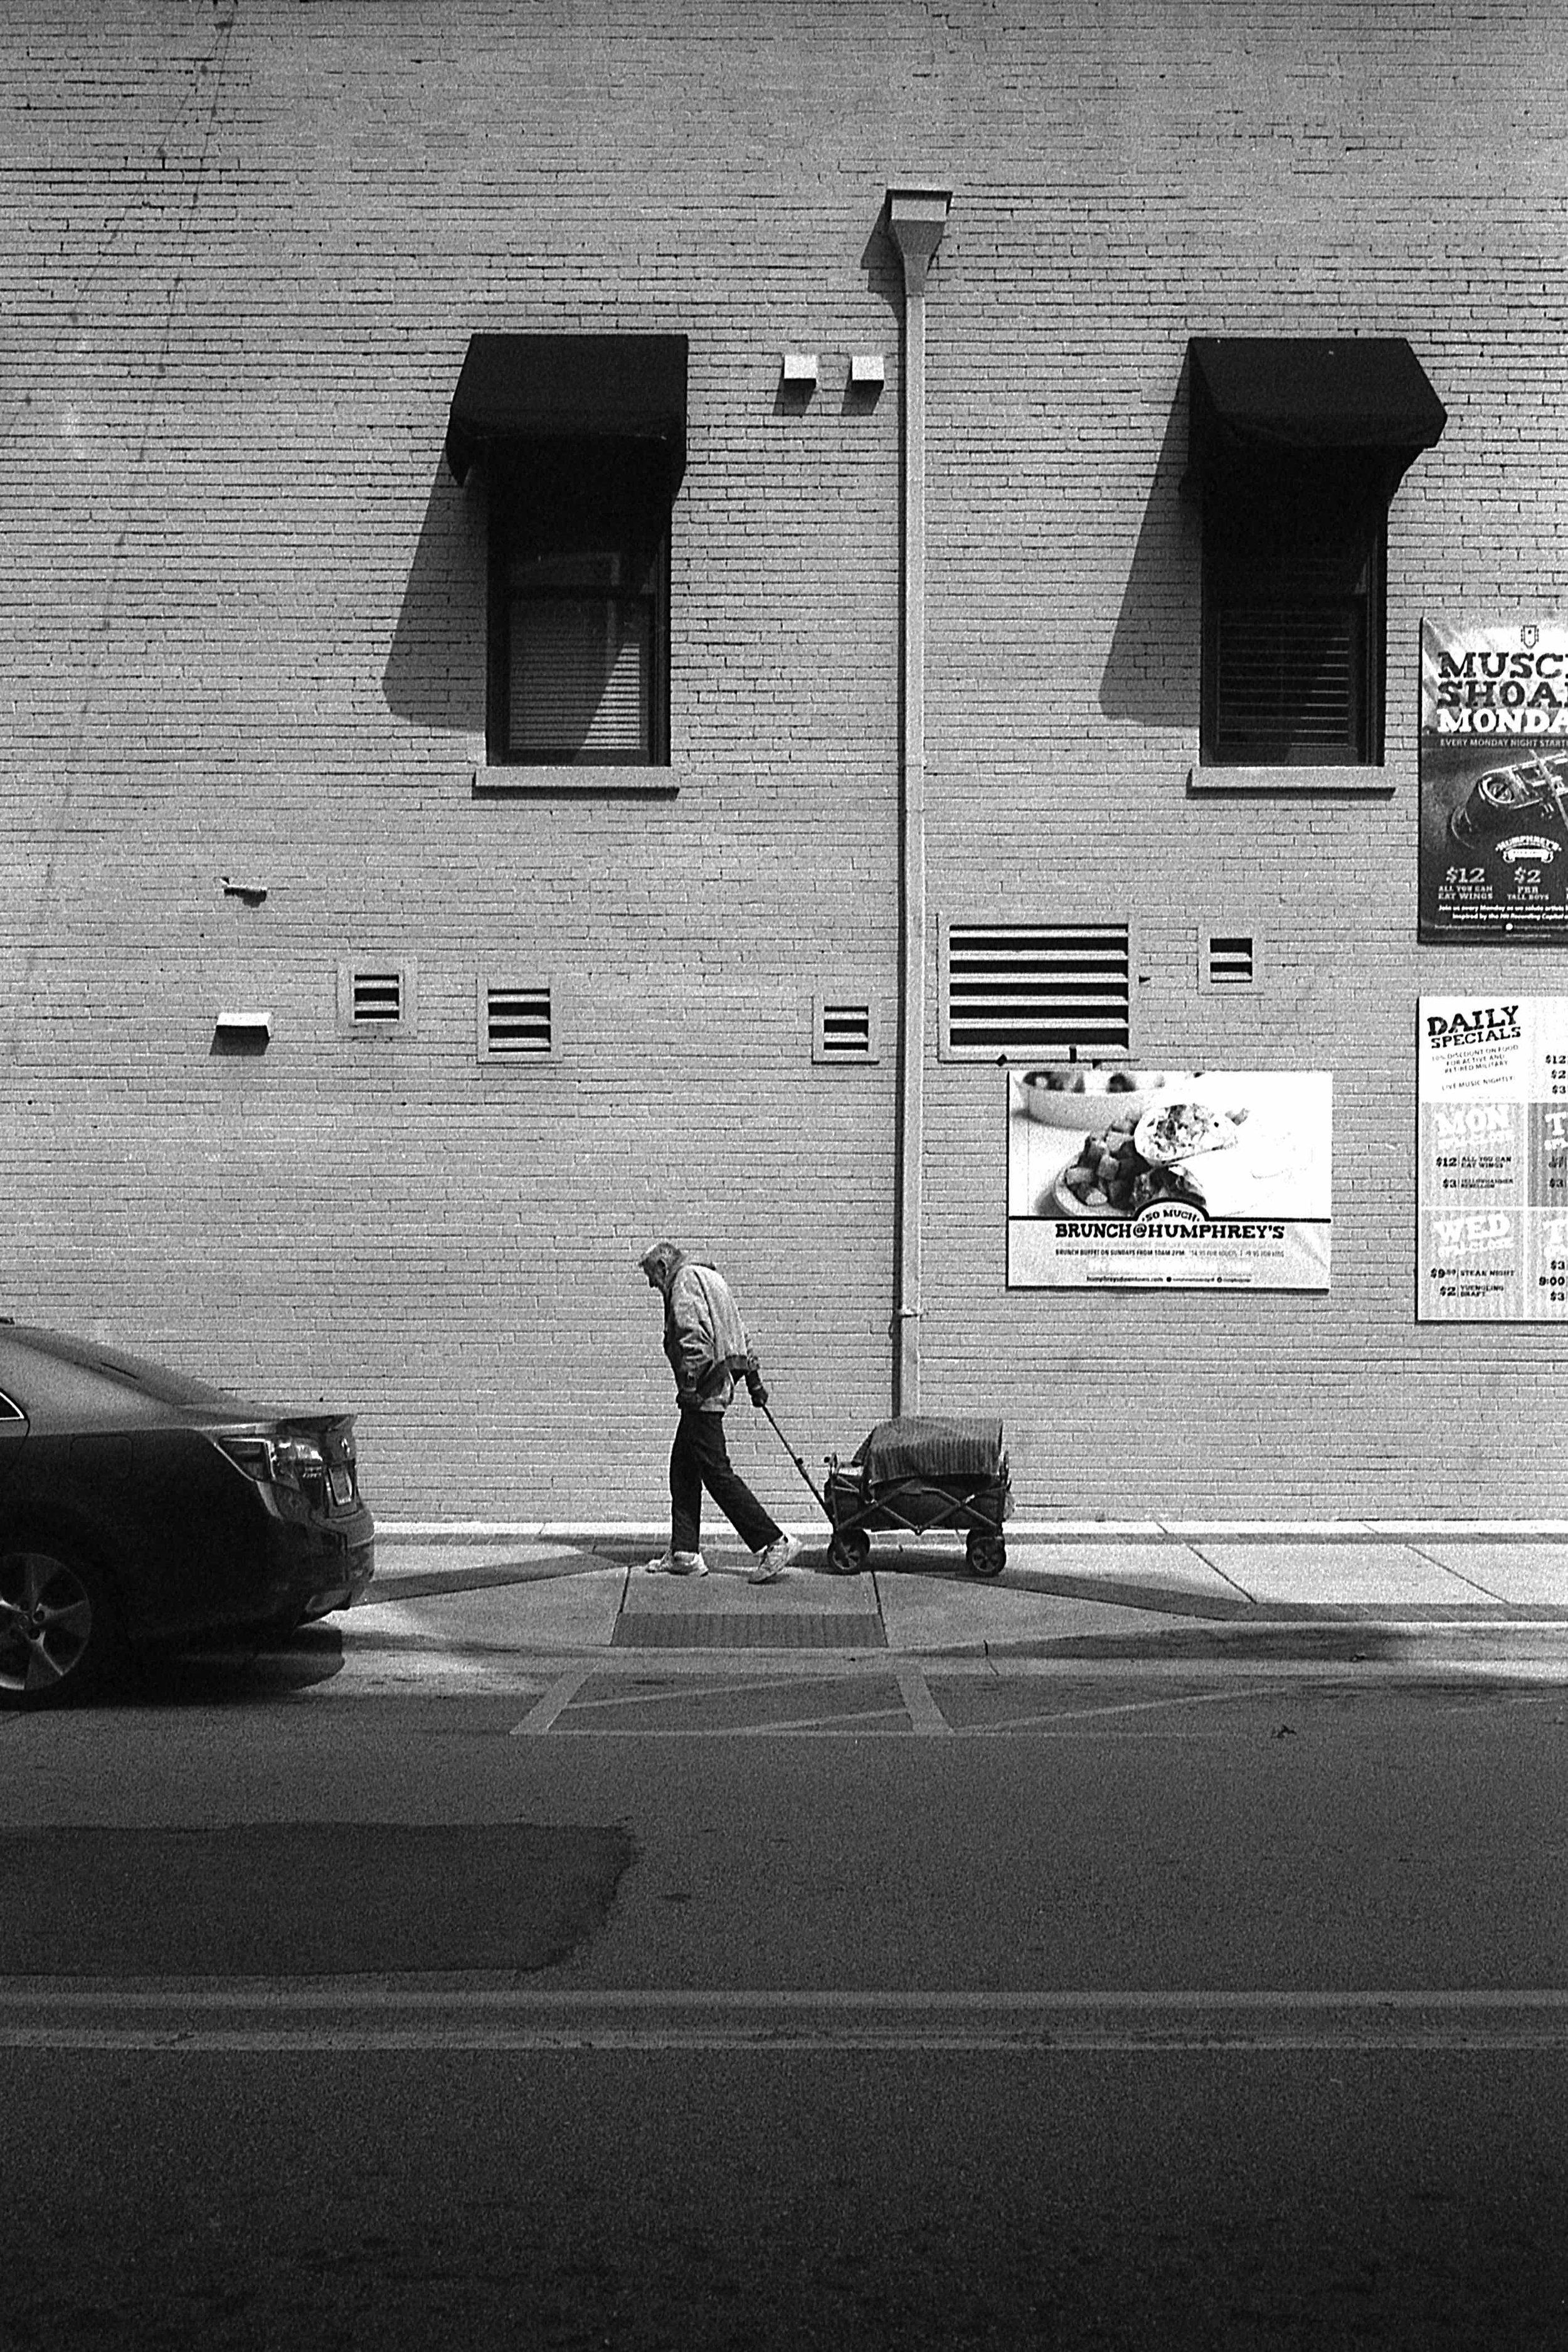 Matt Pittman / Fomapan 400 / Leica M7 / Huntsville, AL